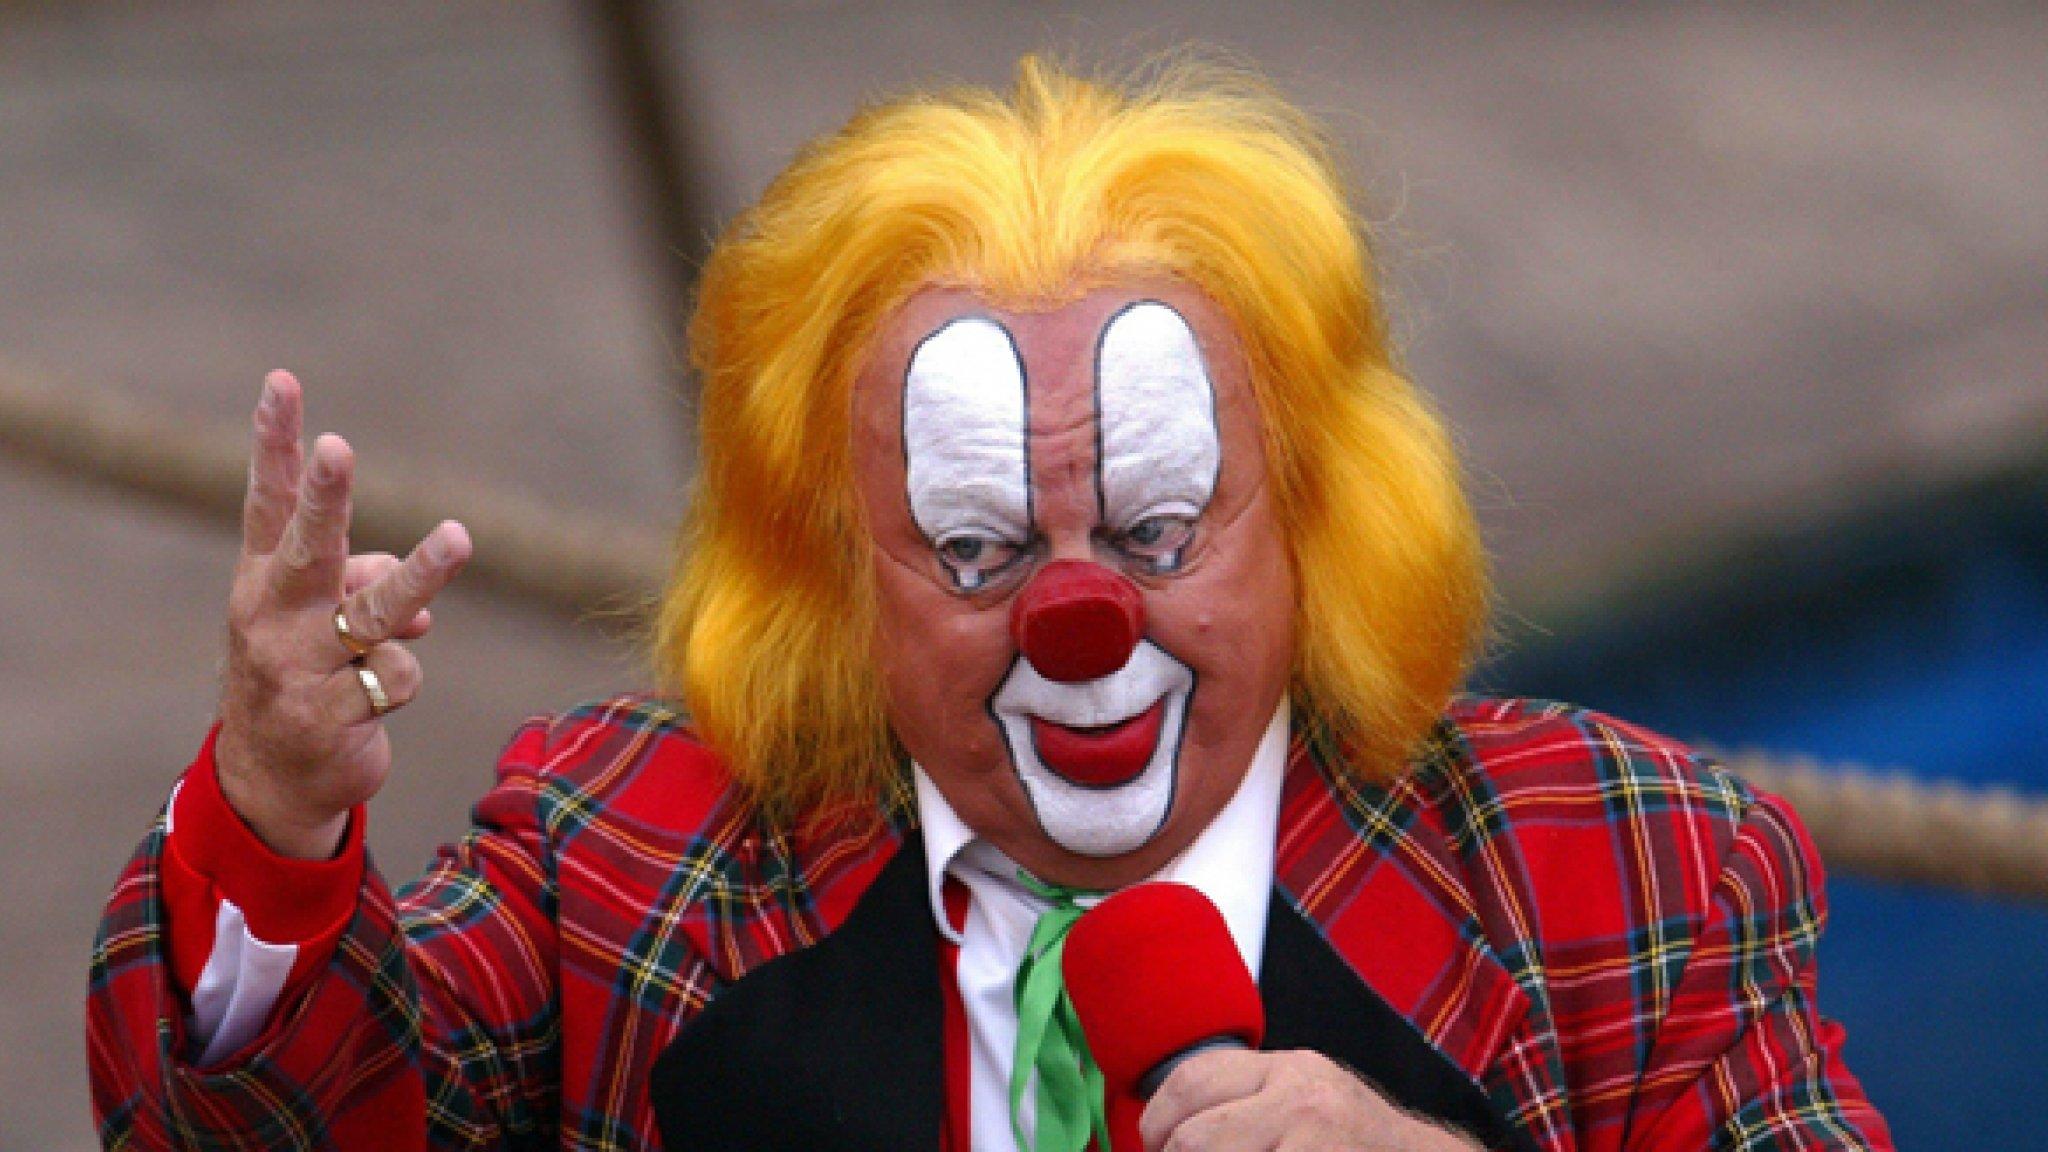 Clown Bassie Mag Revalidatiecentrum Weer Verlaten Rtl